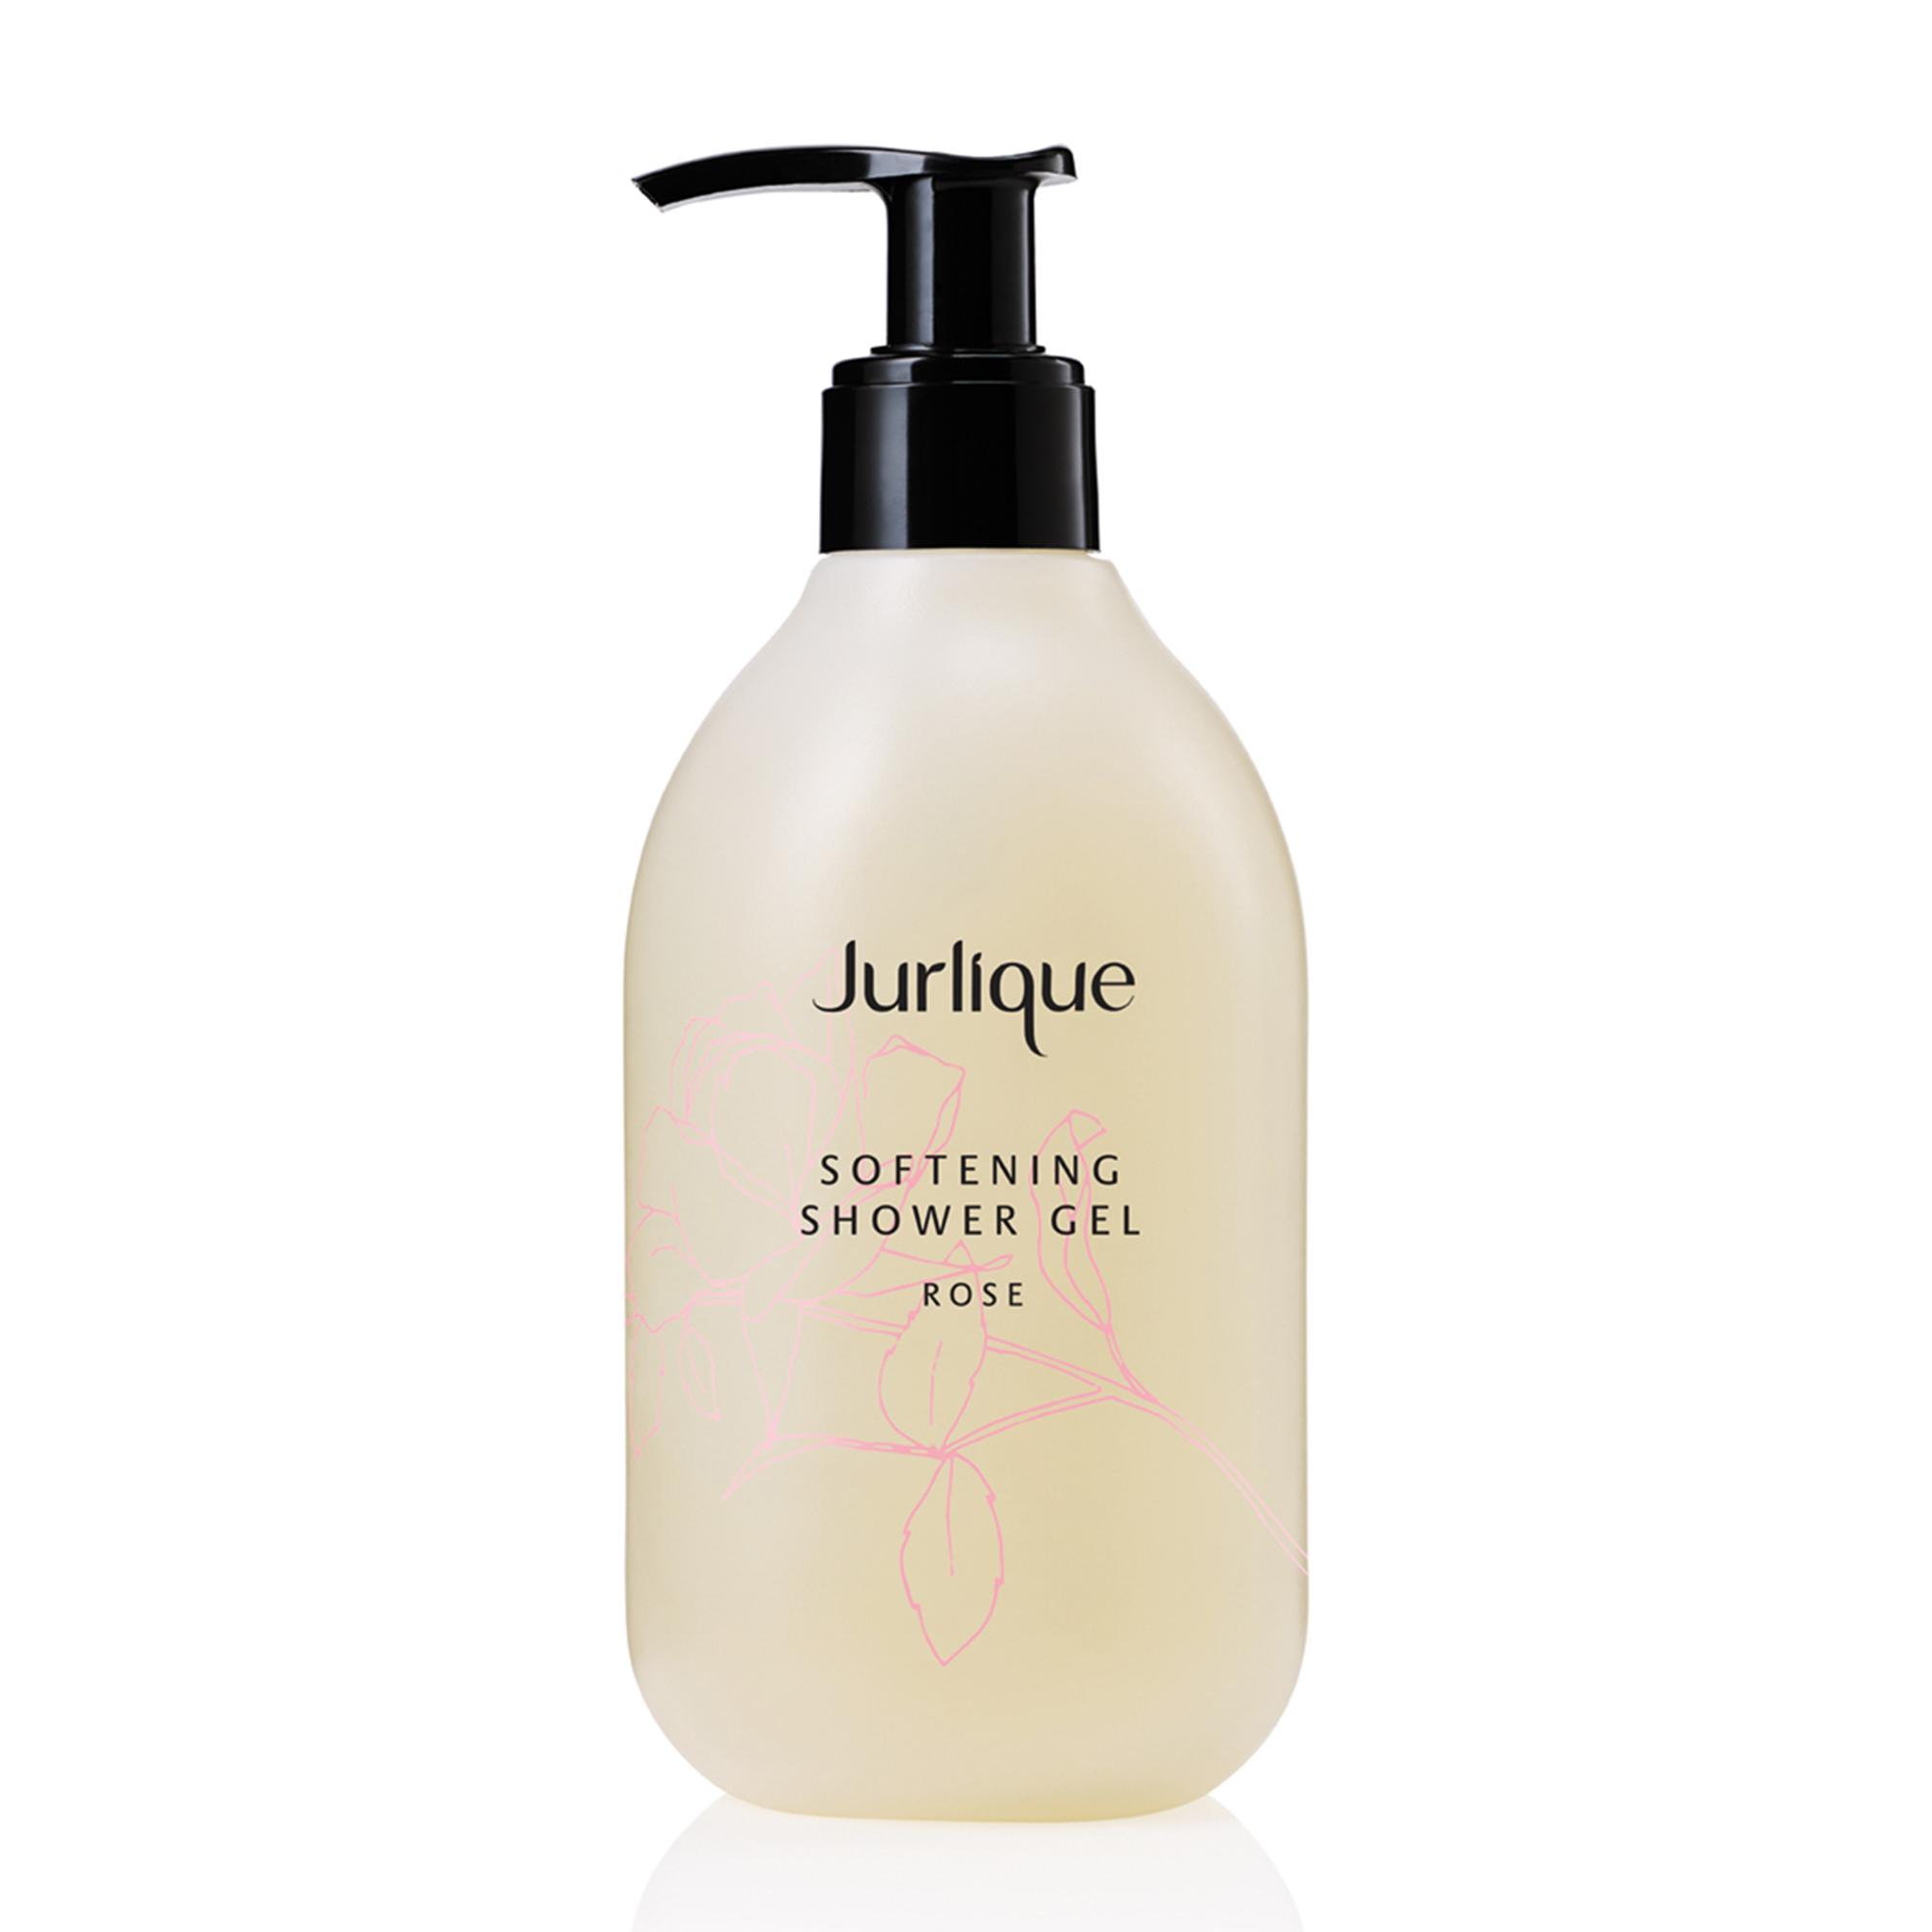 Jurlique Softening Rose Shower Gel, 300 ml